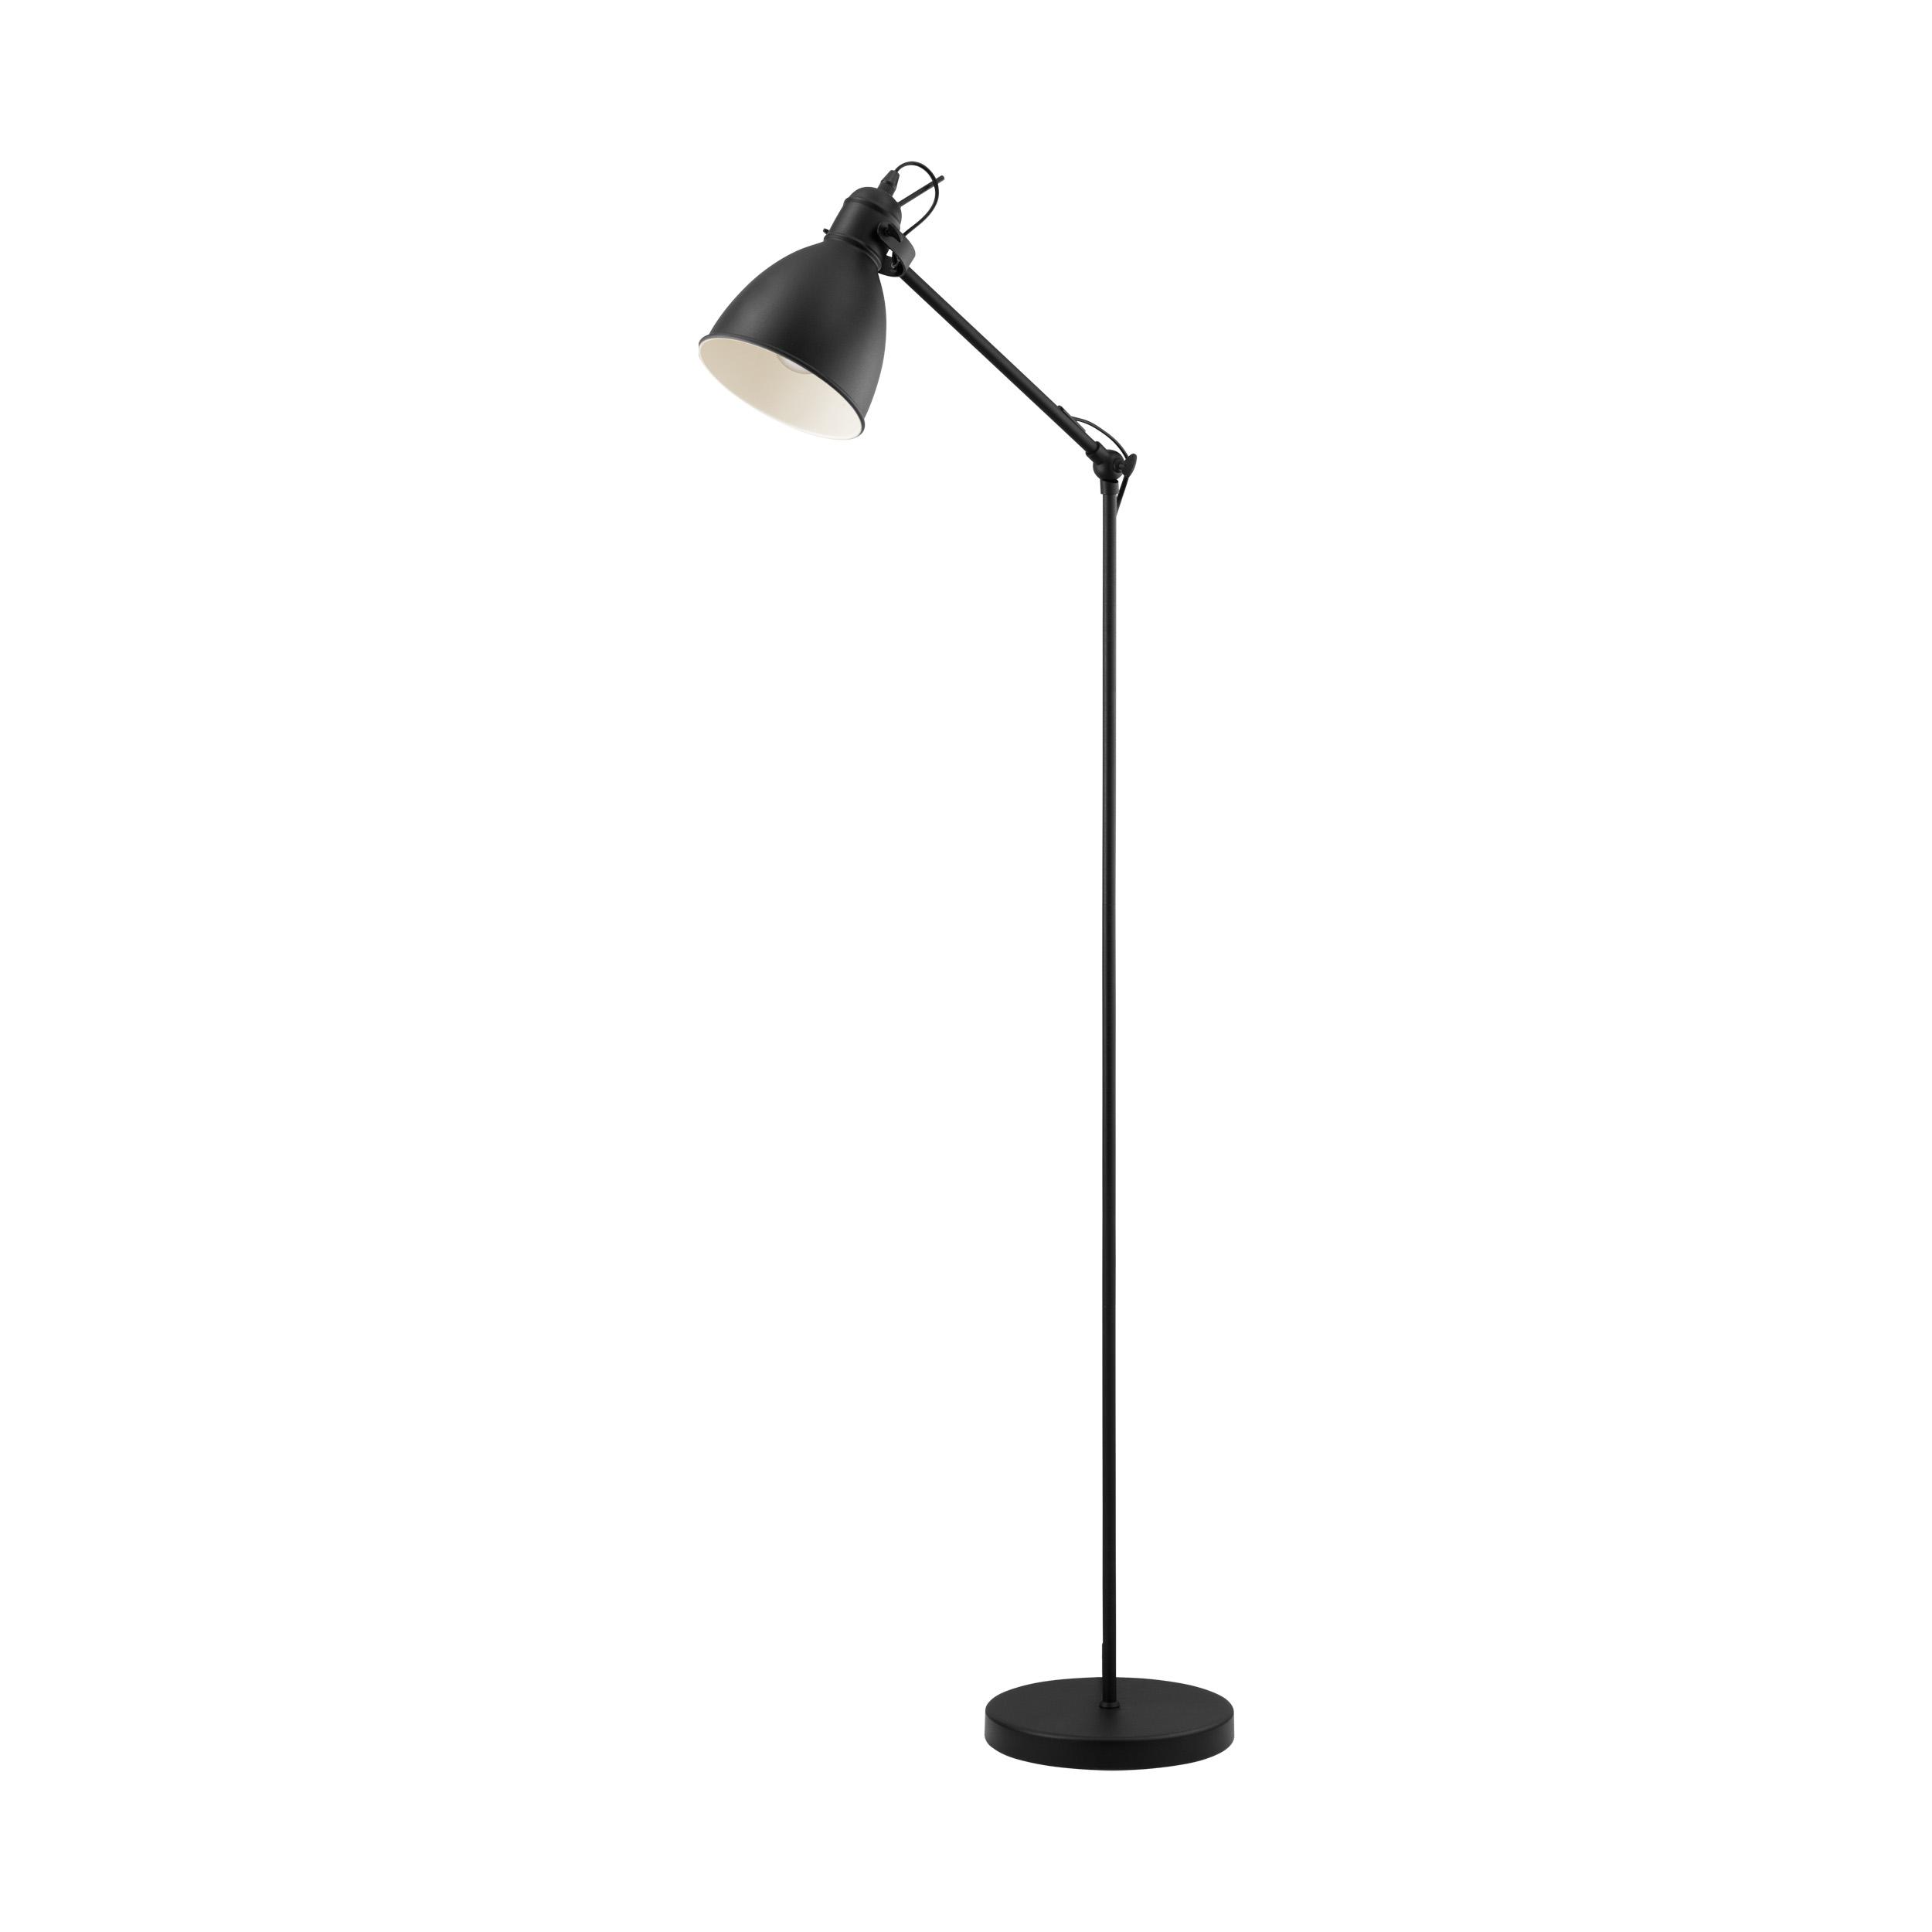 Eglo Priddy Stehlampe